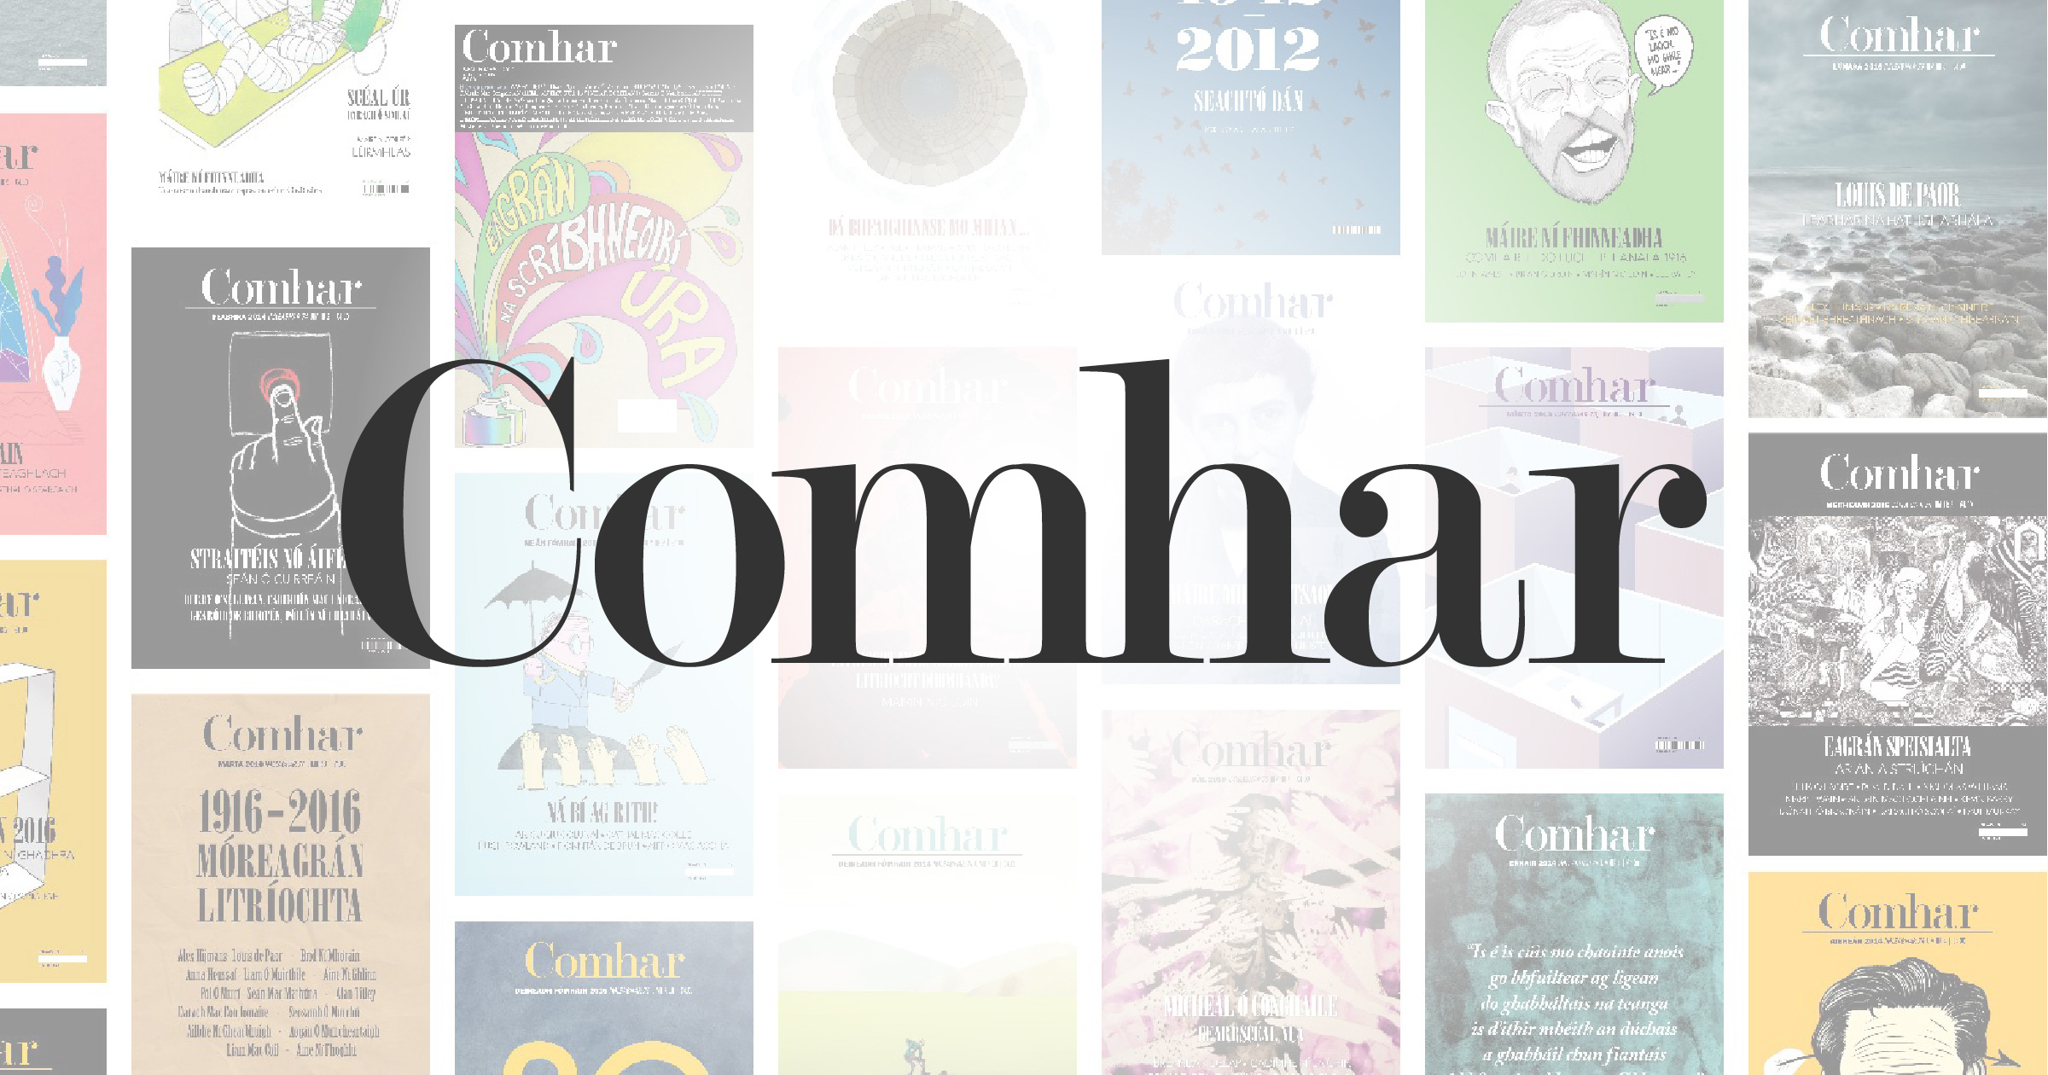 Magazine reading links like Comhar.